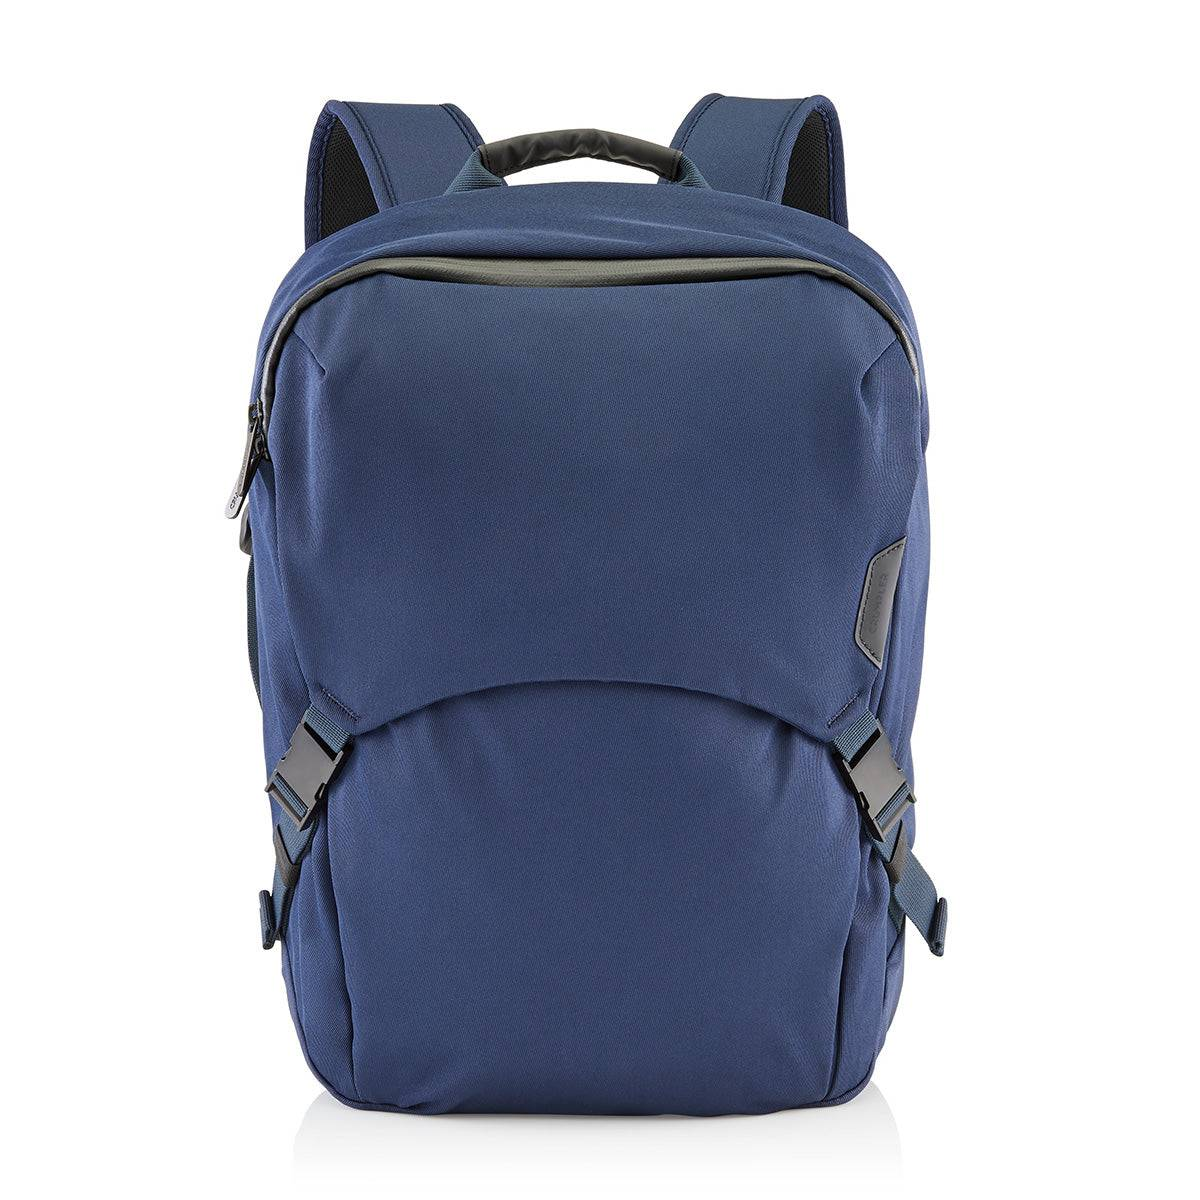 Crumpler Travel Backpack nightsky 30 L